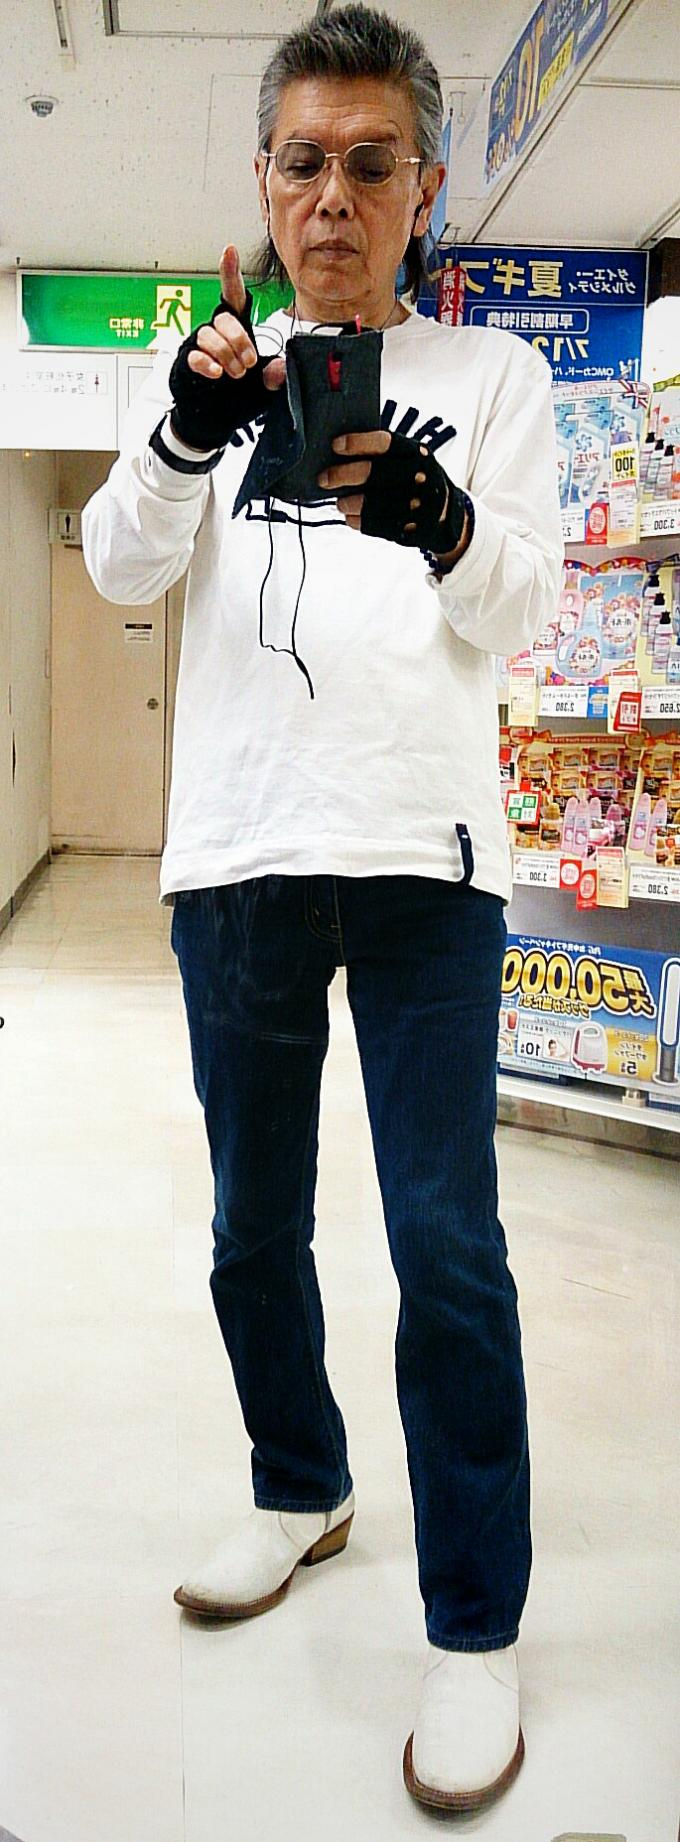 KEN'NNY_20150622